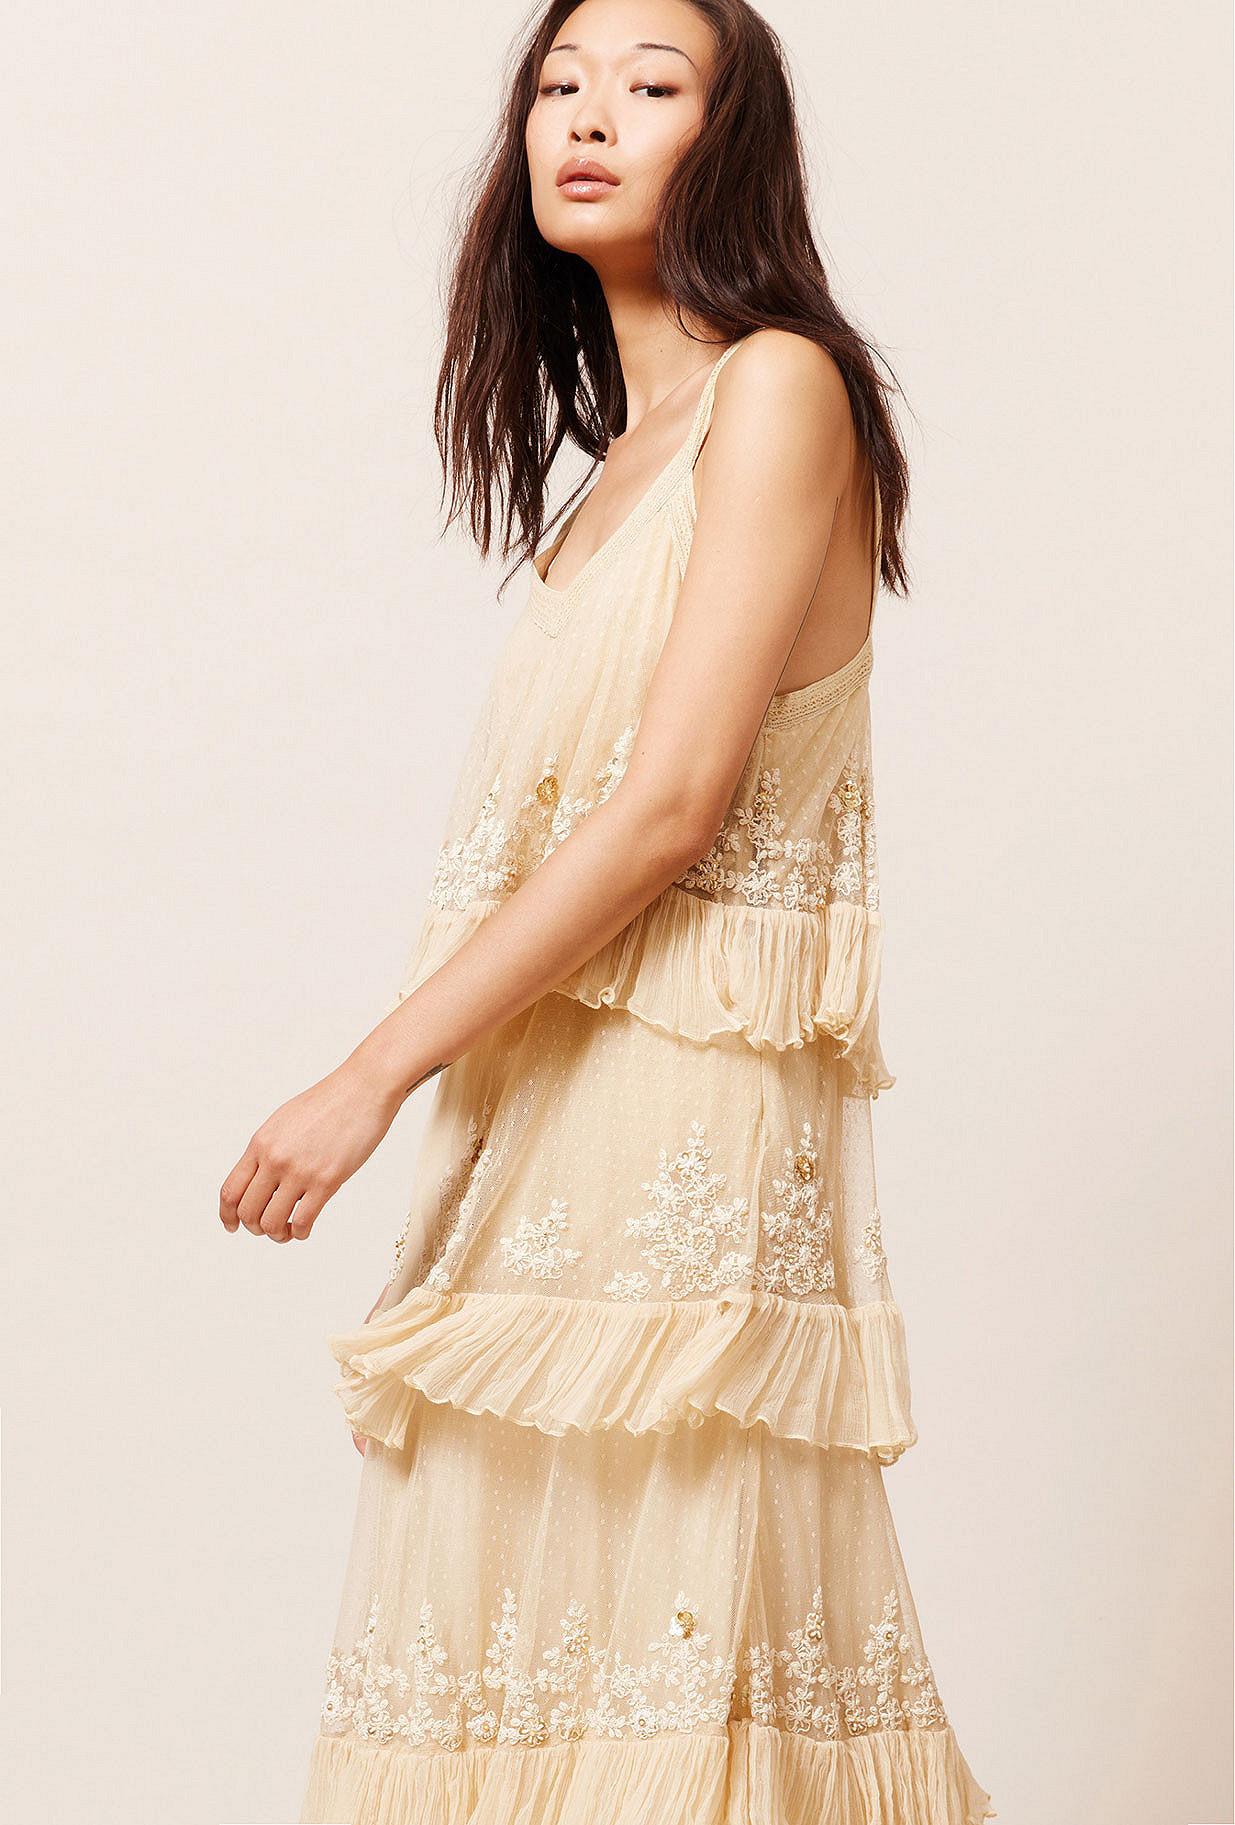 Ecru  Dress  Beachella Mes demoiselles fashion clothes designer Paris